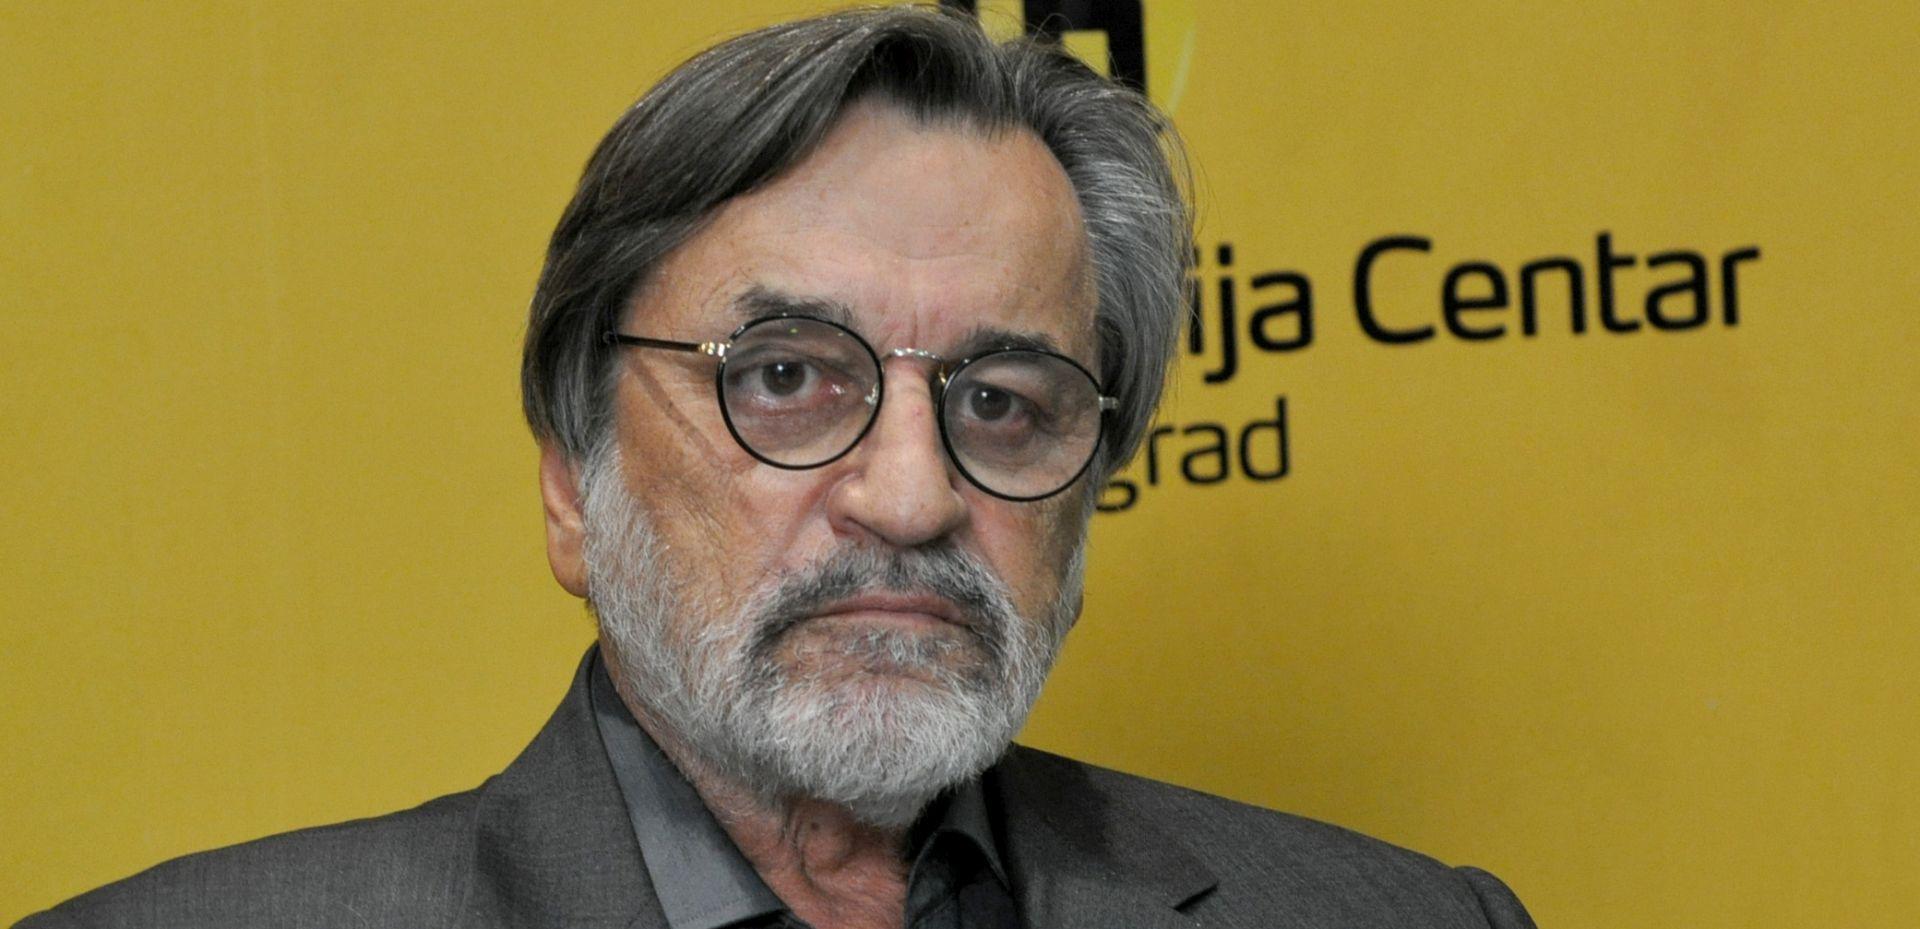 LEGENDA JUGOSLAVENSKOG GLUMIŠTA: Preminuo Dragan Nikolić